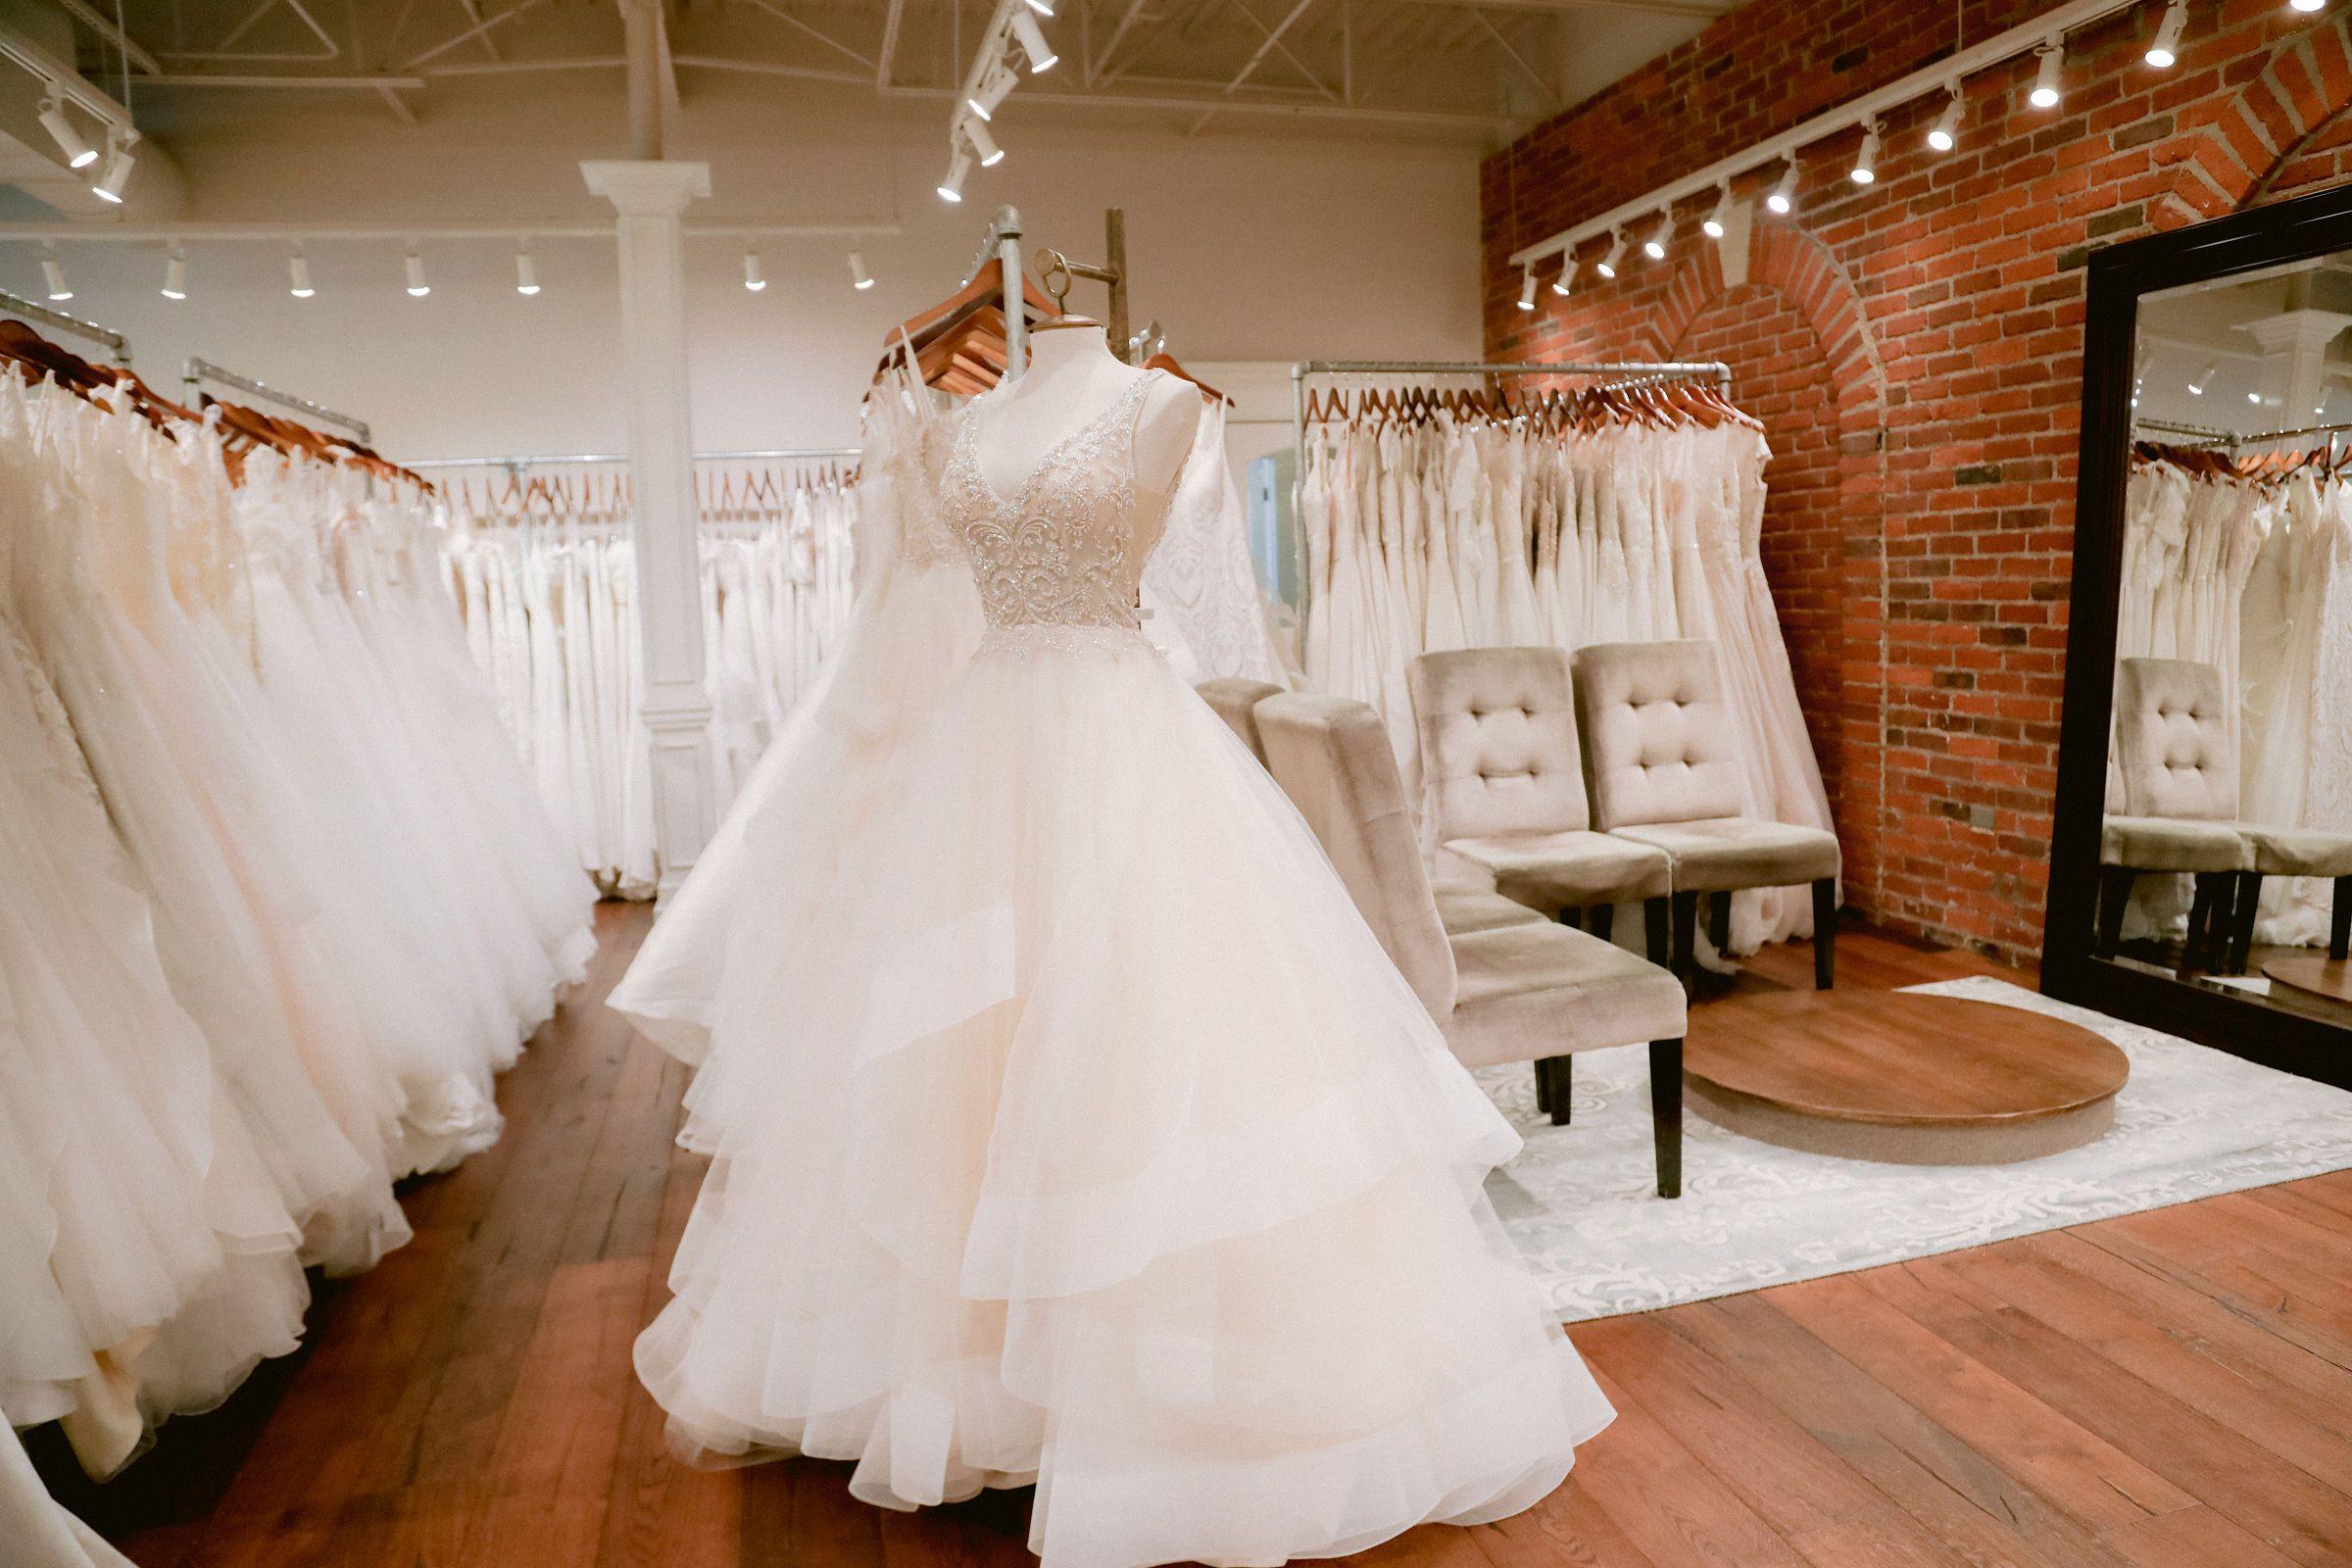 Emily Hart Bridal Kansas City S 1 Bridal Boutique Bridal Boutique Interior Wedding Dress Boutiques City Wedding Dress